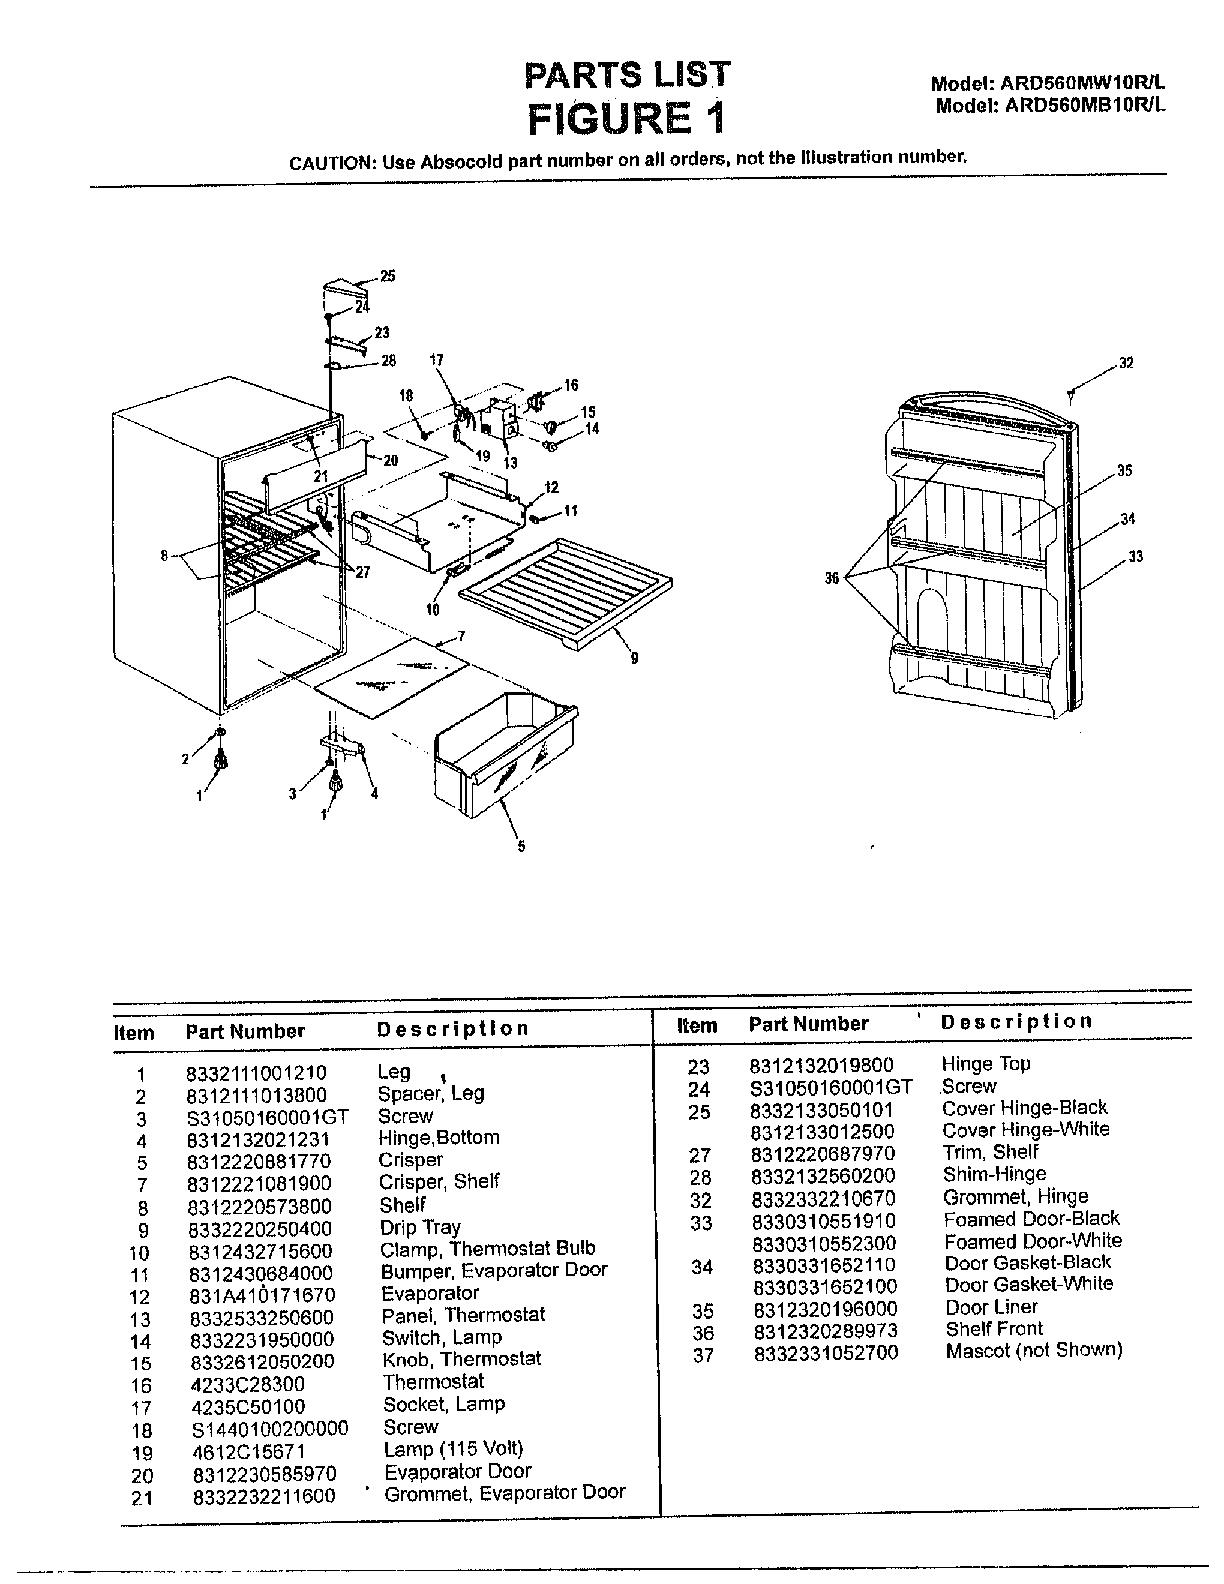 Sanyo model ARD560MW10R/L under counter refrigerator